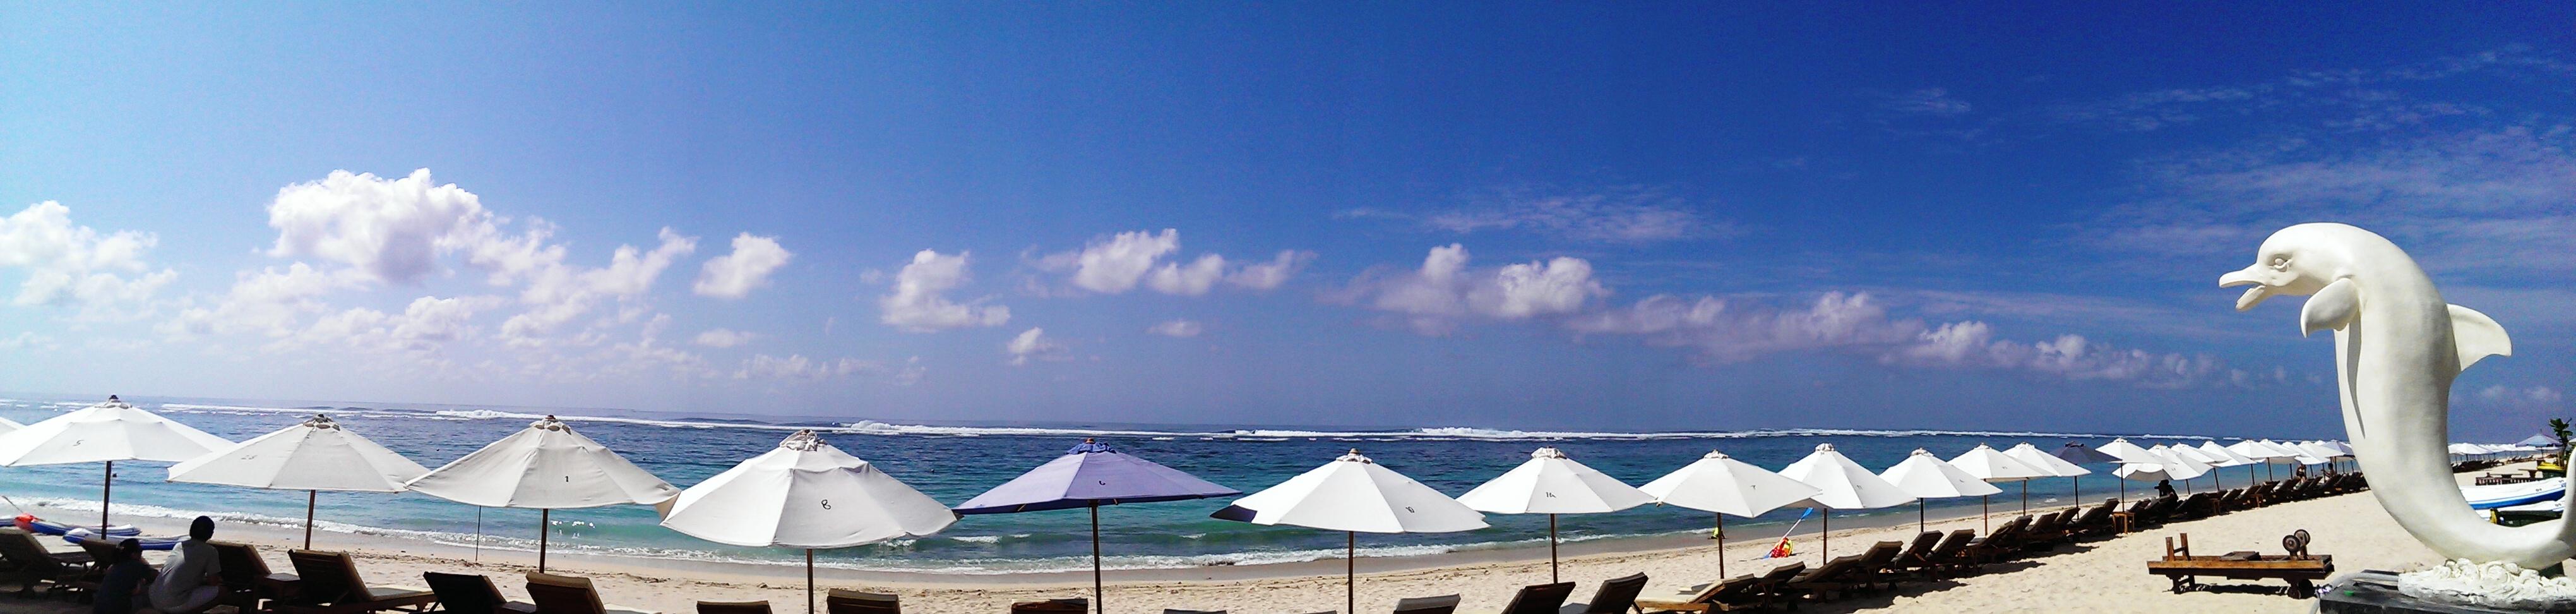 Pantai Pandawa, 22Kartika